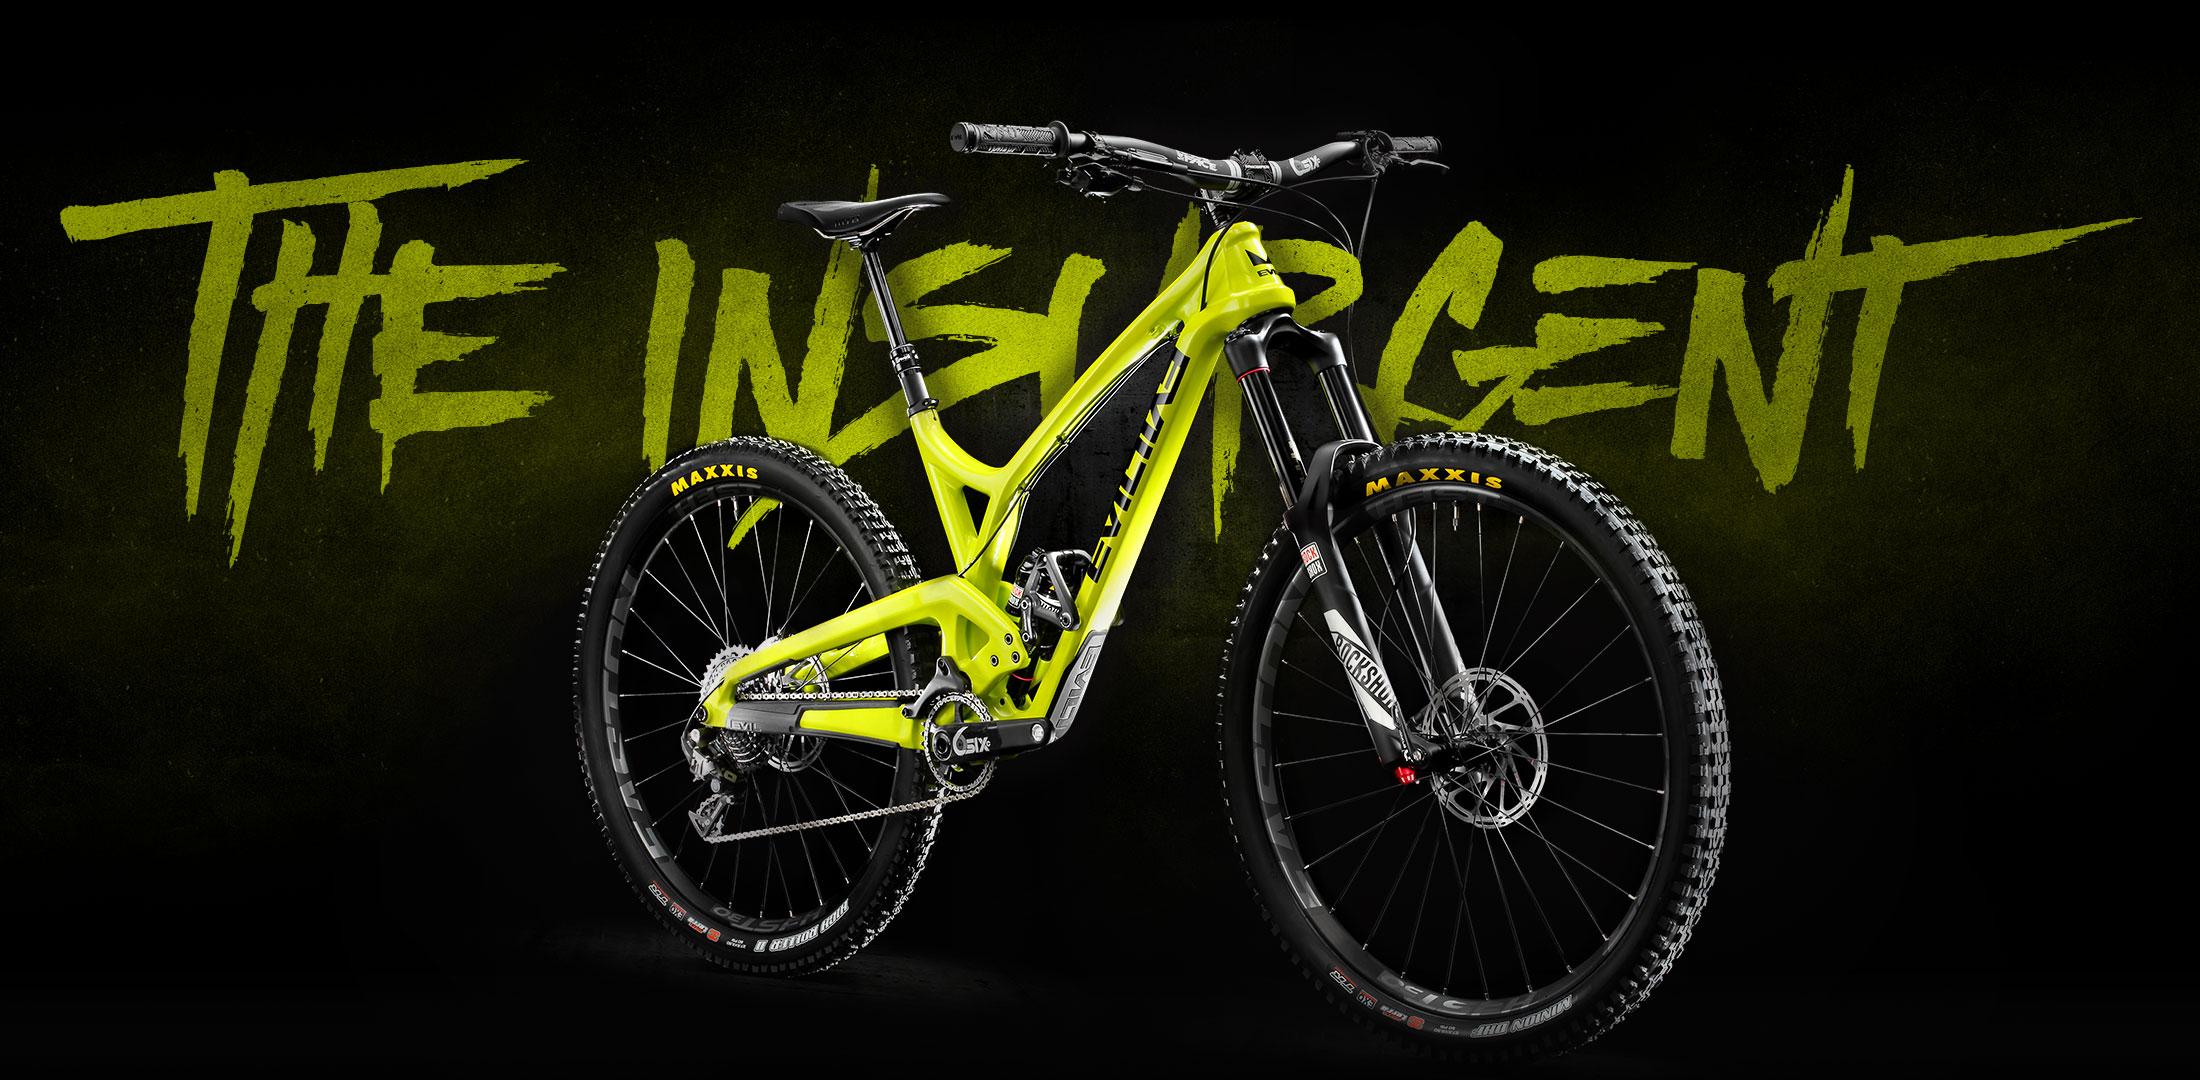 evil-insurgent-bike-hero-2200x1080